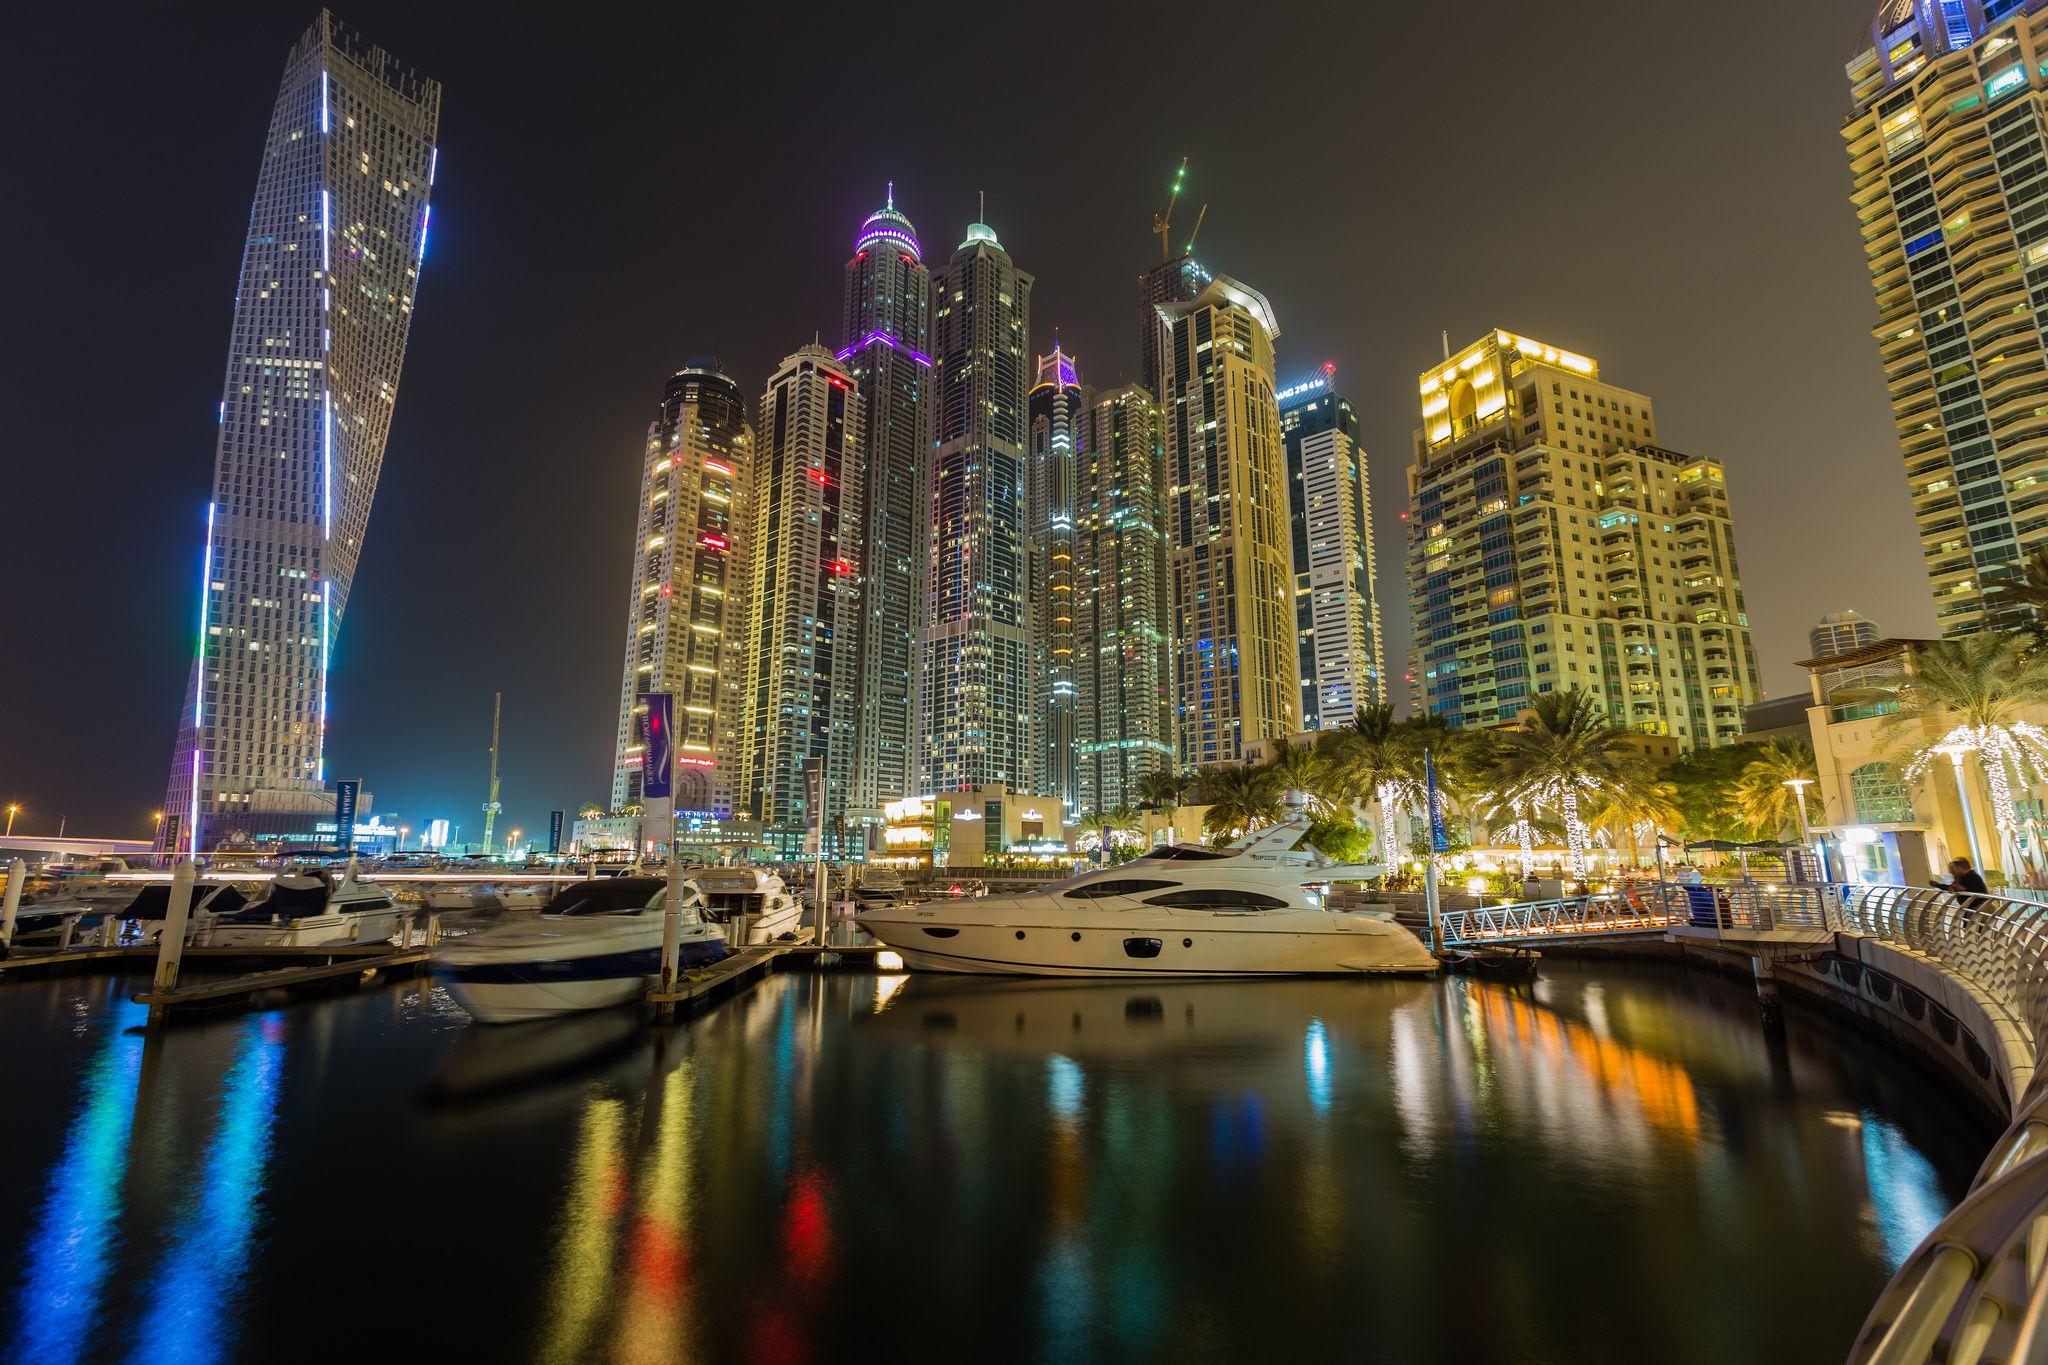 Good Wallpaper Night Dubai - 784f7aa7d8cdedd8d0c043d7a117d162  Perfect Image Reference-336413.jpg